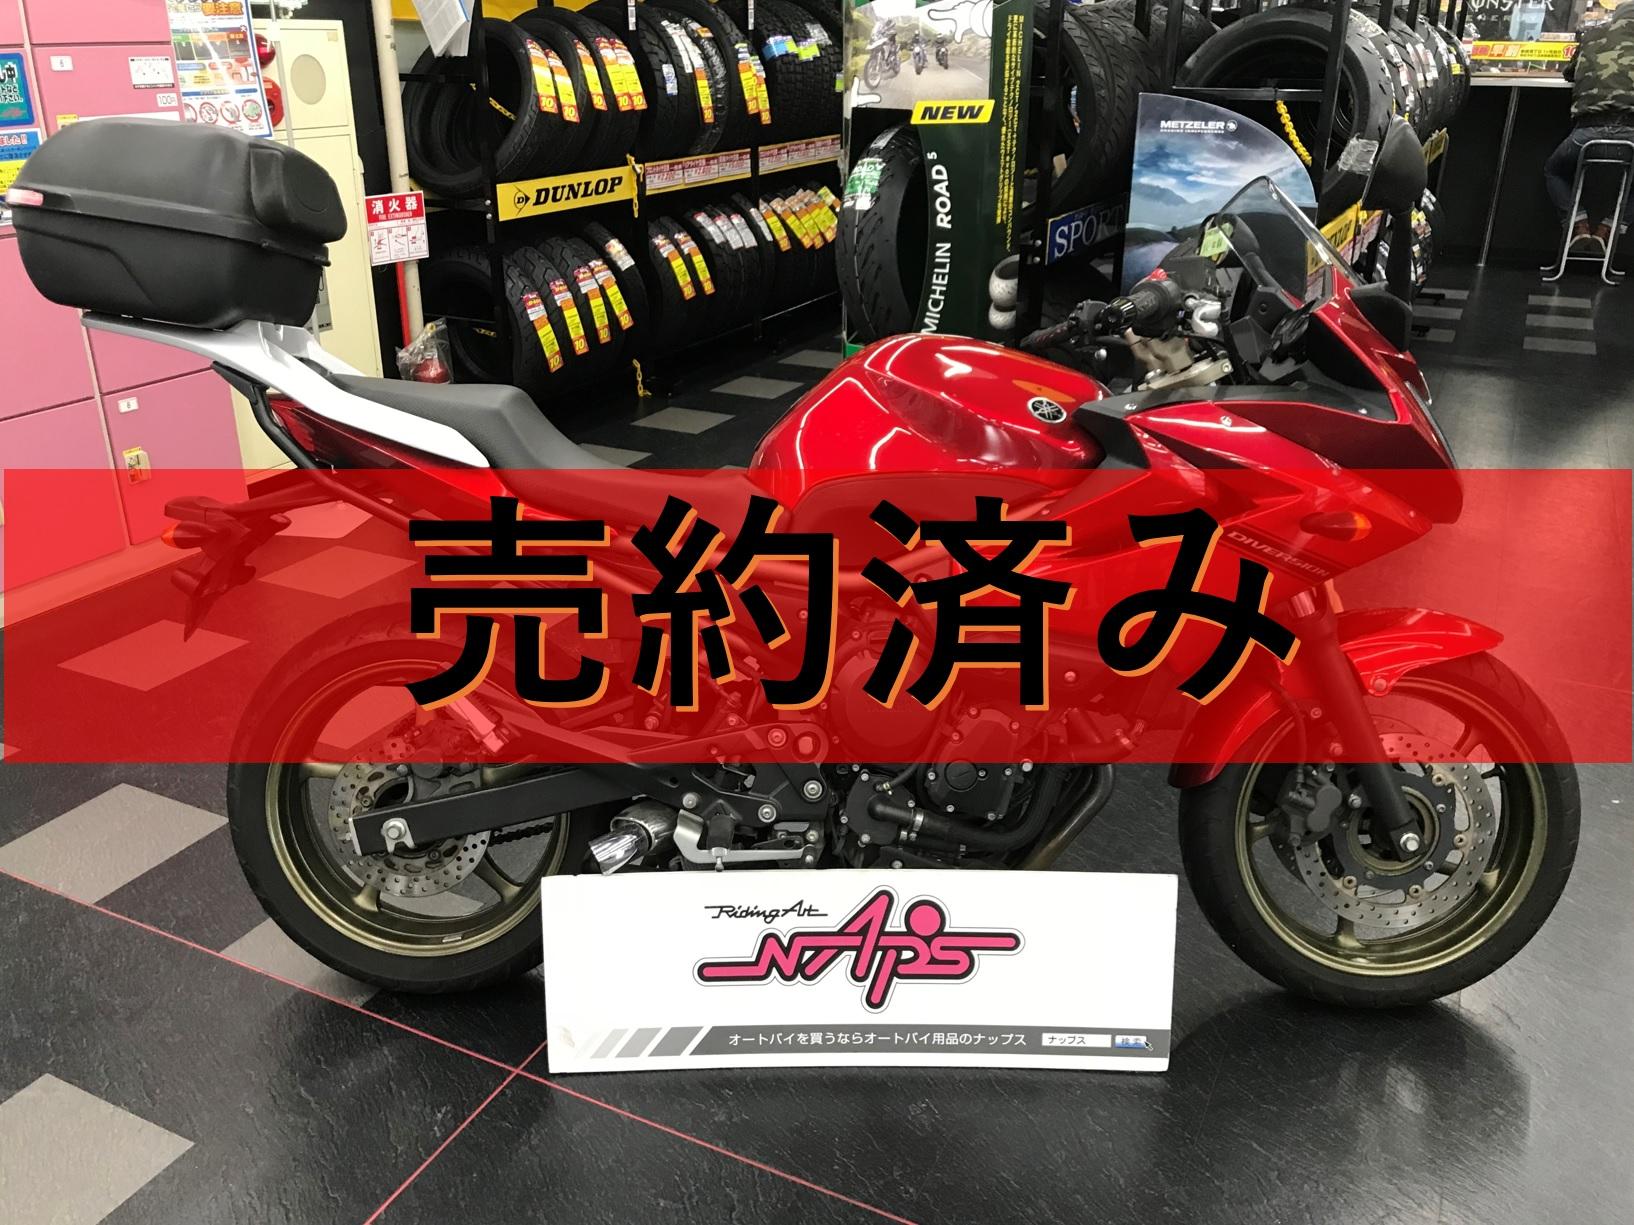 YAMAHA 【販売車両】XJ6 ディバージョン プレスト正規